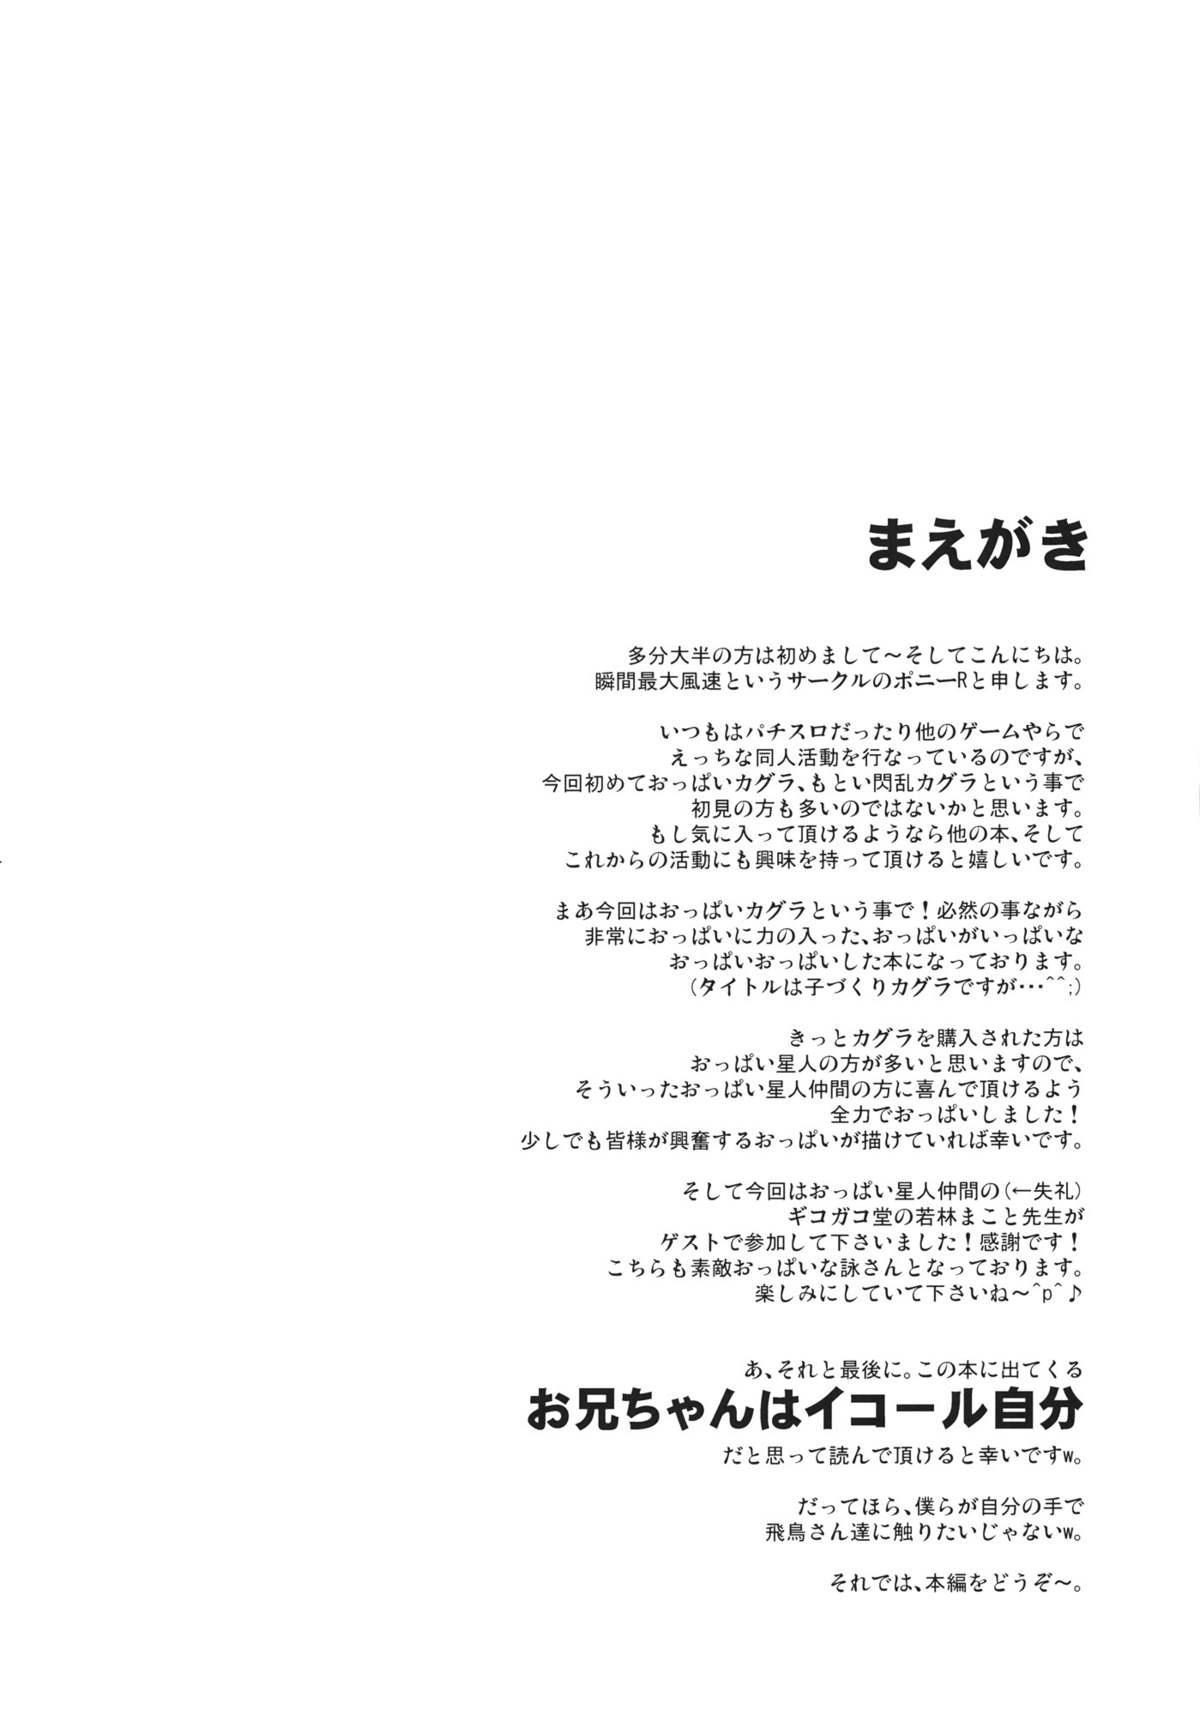 Kodukuri Kagura 2